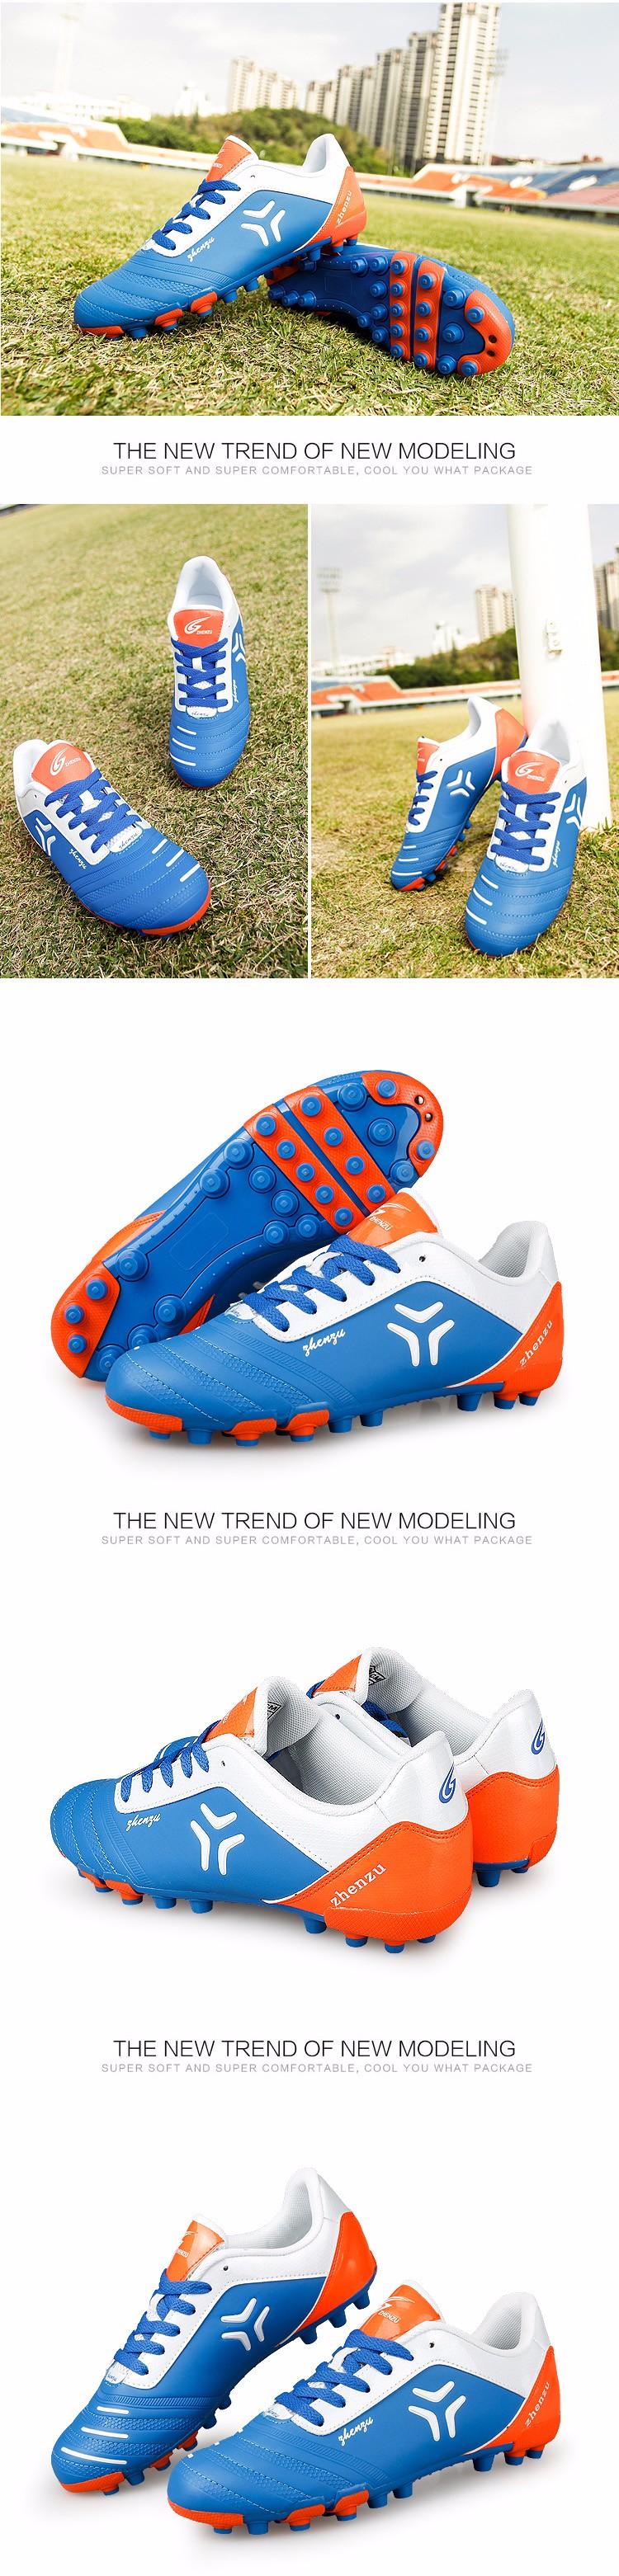 ZHENZU 2017 Football Shoes Soccer Cleats Boots chuteira futebol Training Teenagers Kids AG Artificial Ground chaussure foot